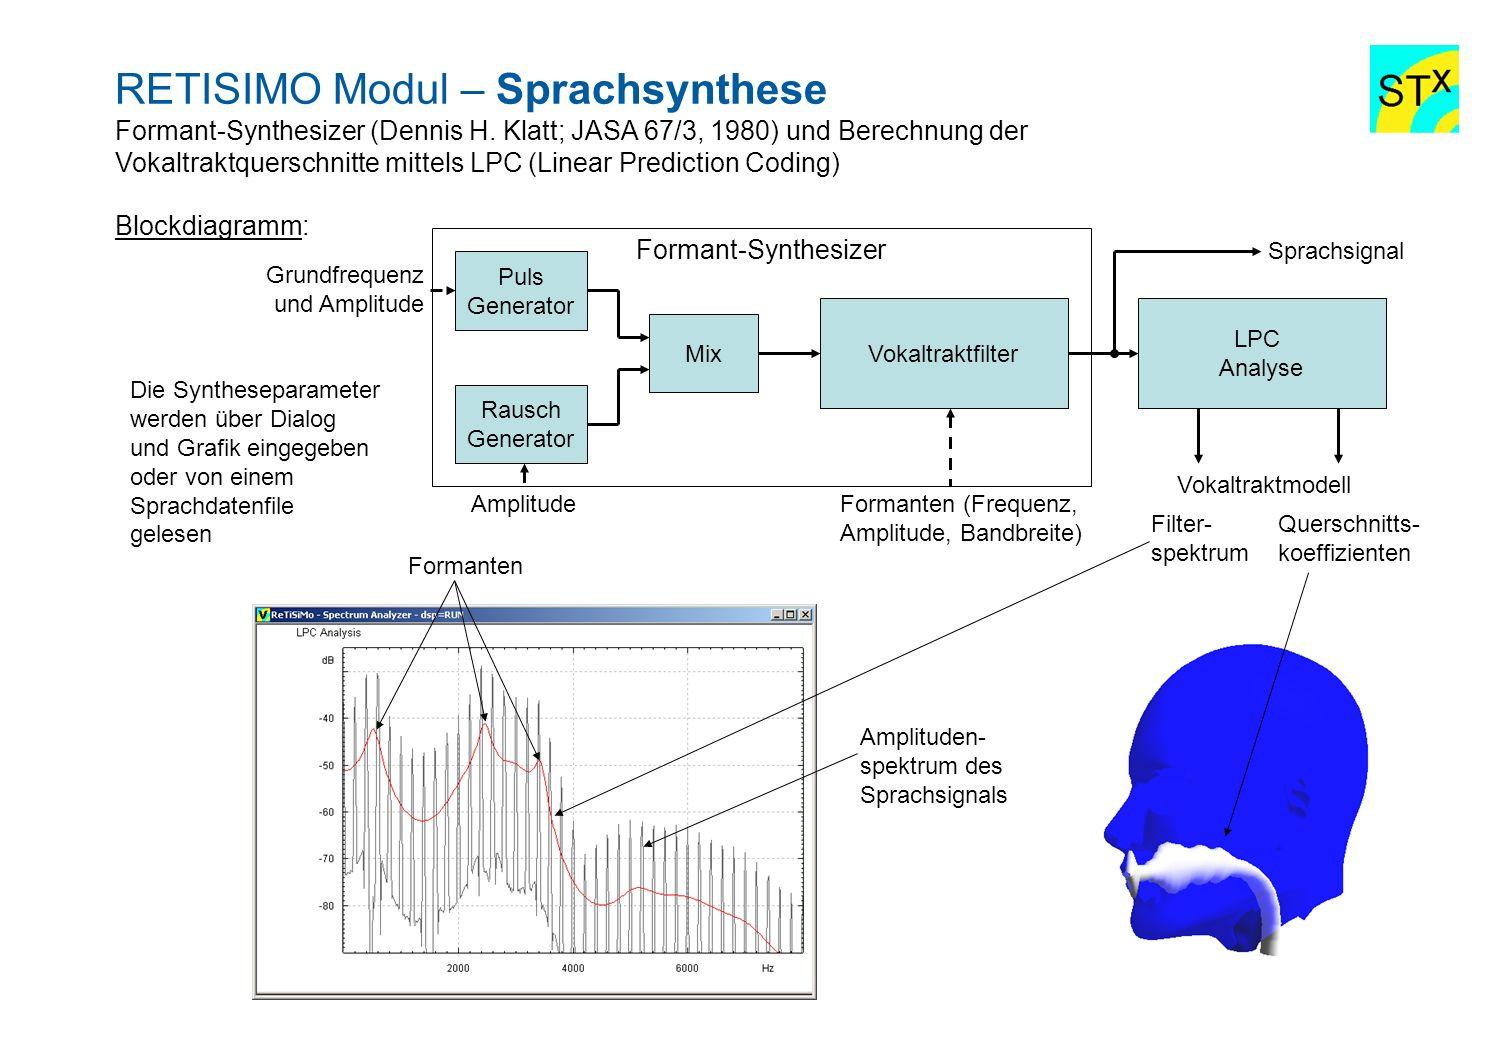 RETISIMO Modul – Sprachsynthese